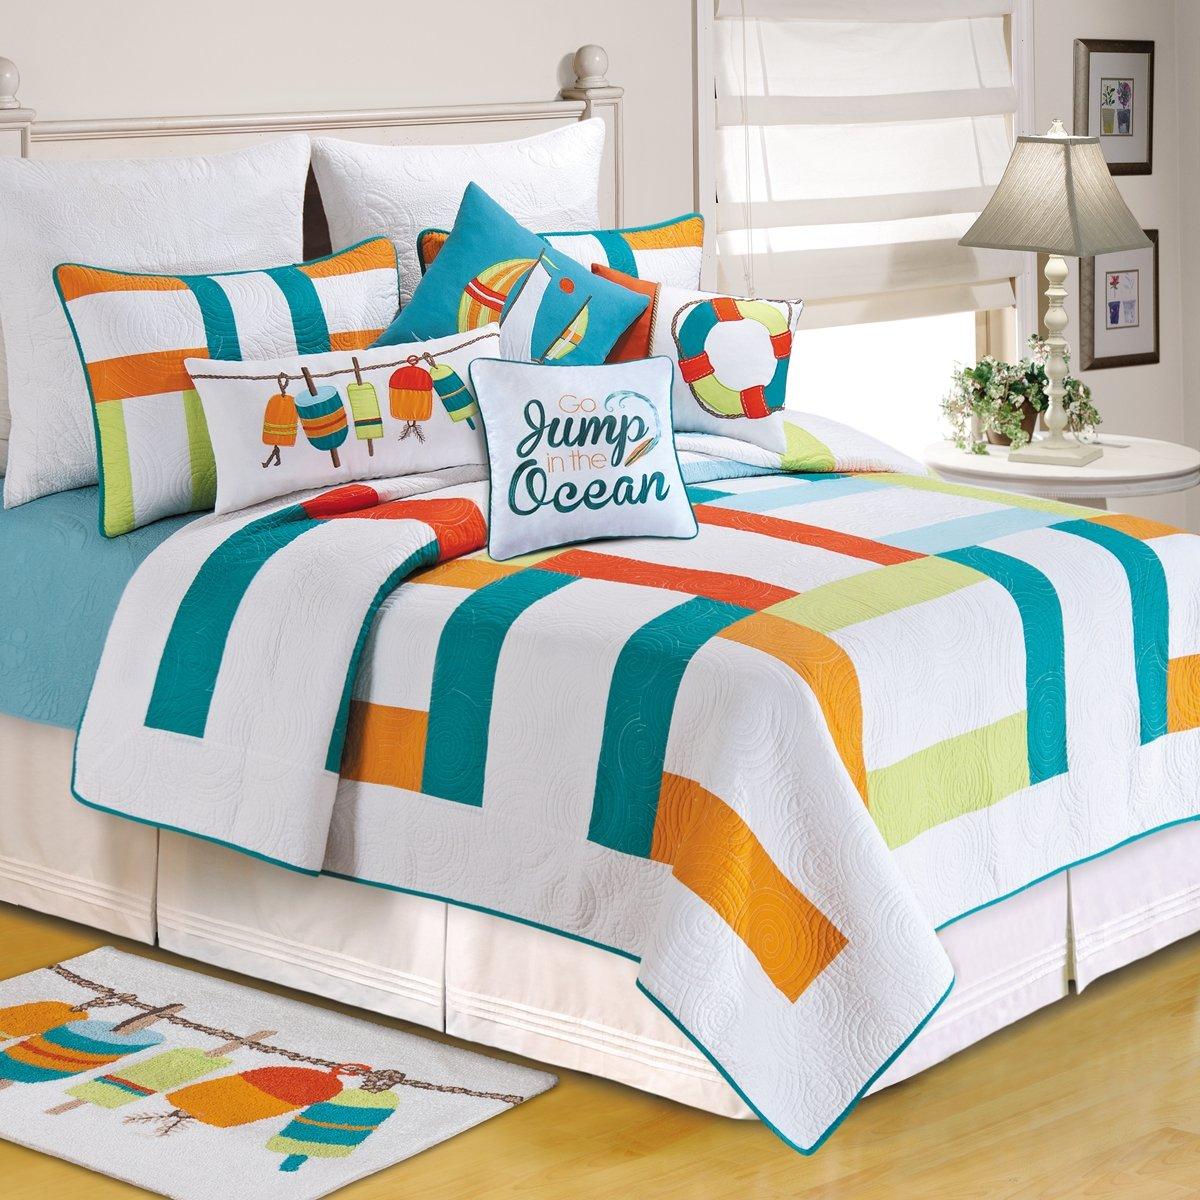 C&F Home 82011.8686 Zuma Bay for Q Quilt, Full/Queen, White